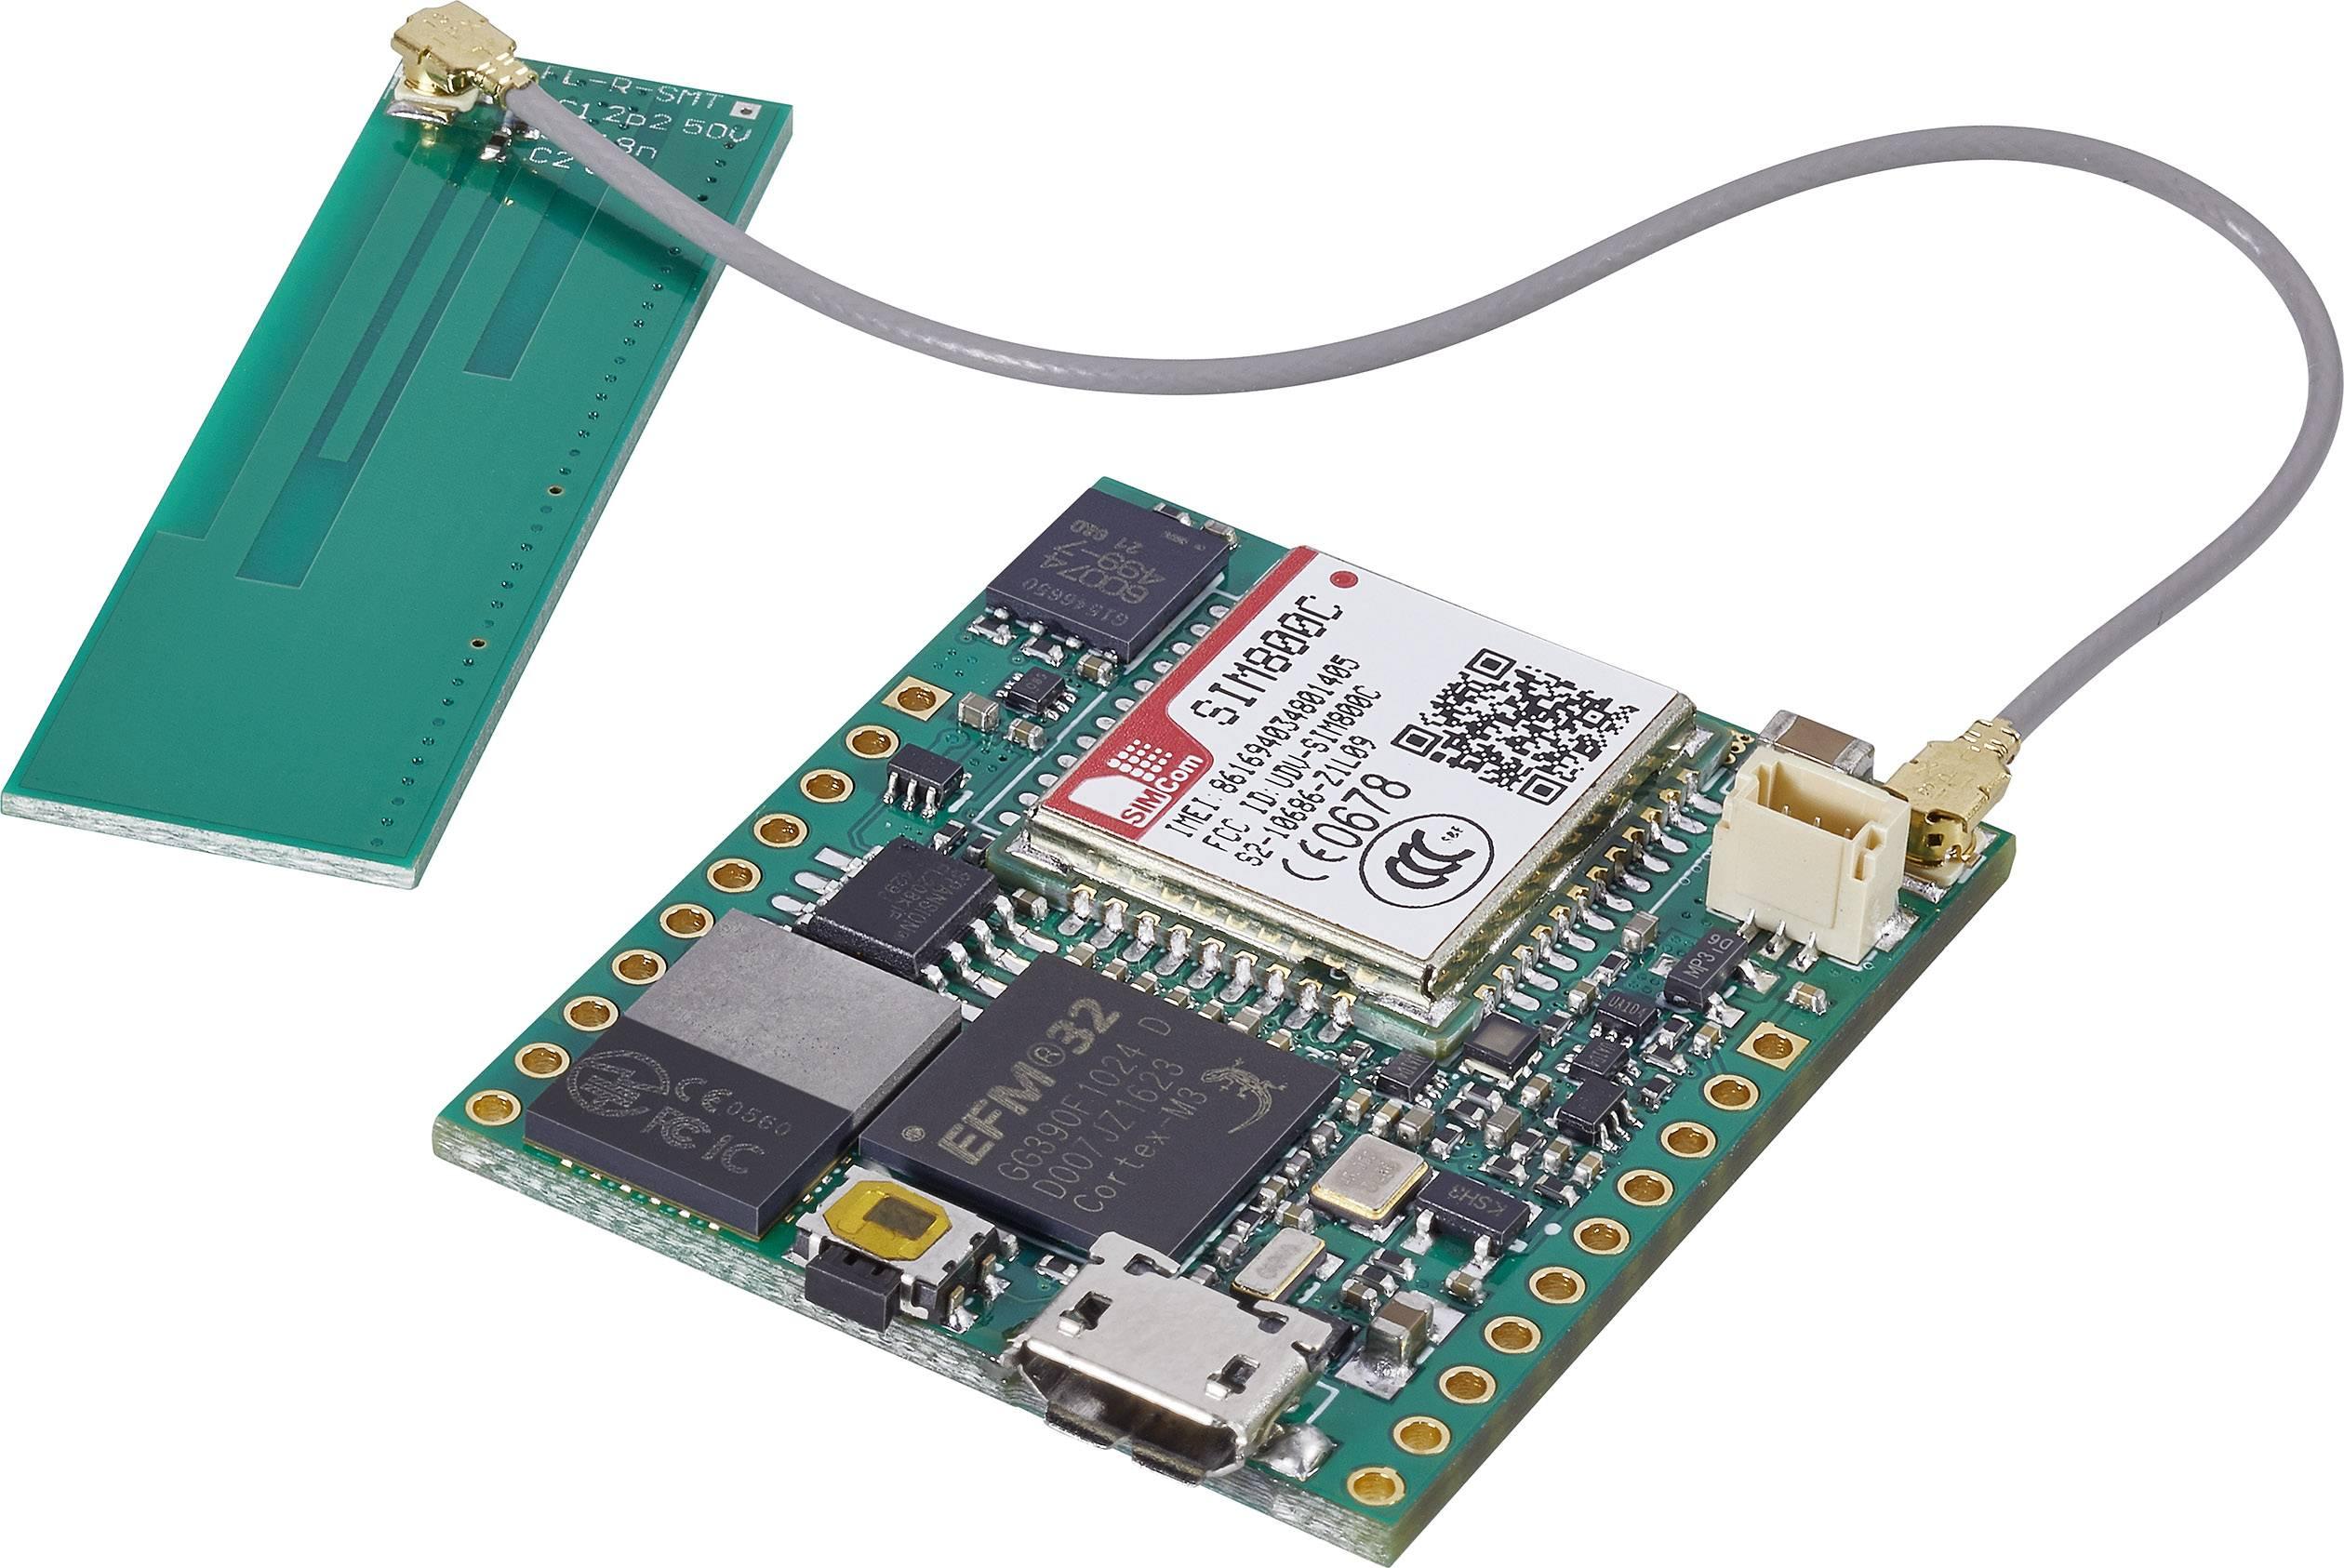 Sada C-Control IoT Starter Kit 10 Embedded GSM Modul, 32 Bit ARM Cortex-M3 MCU